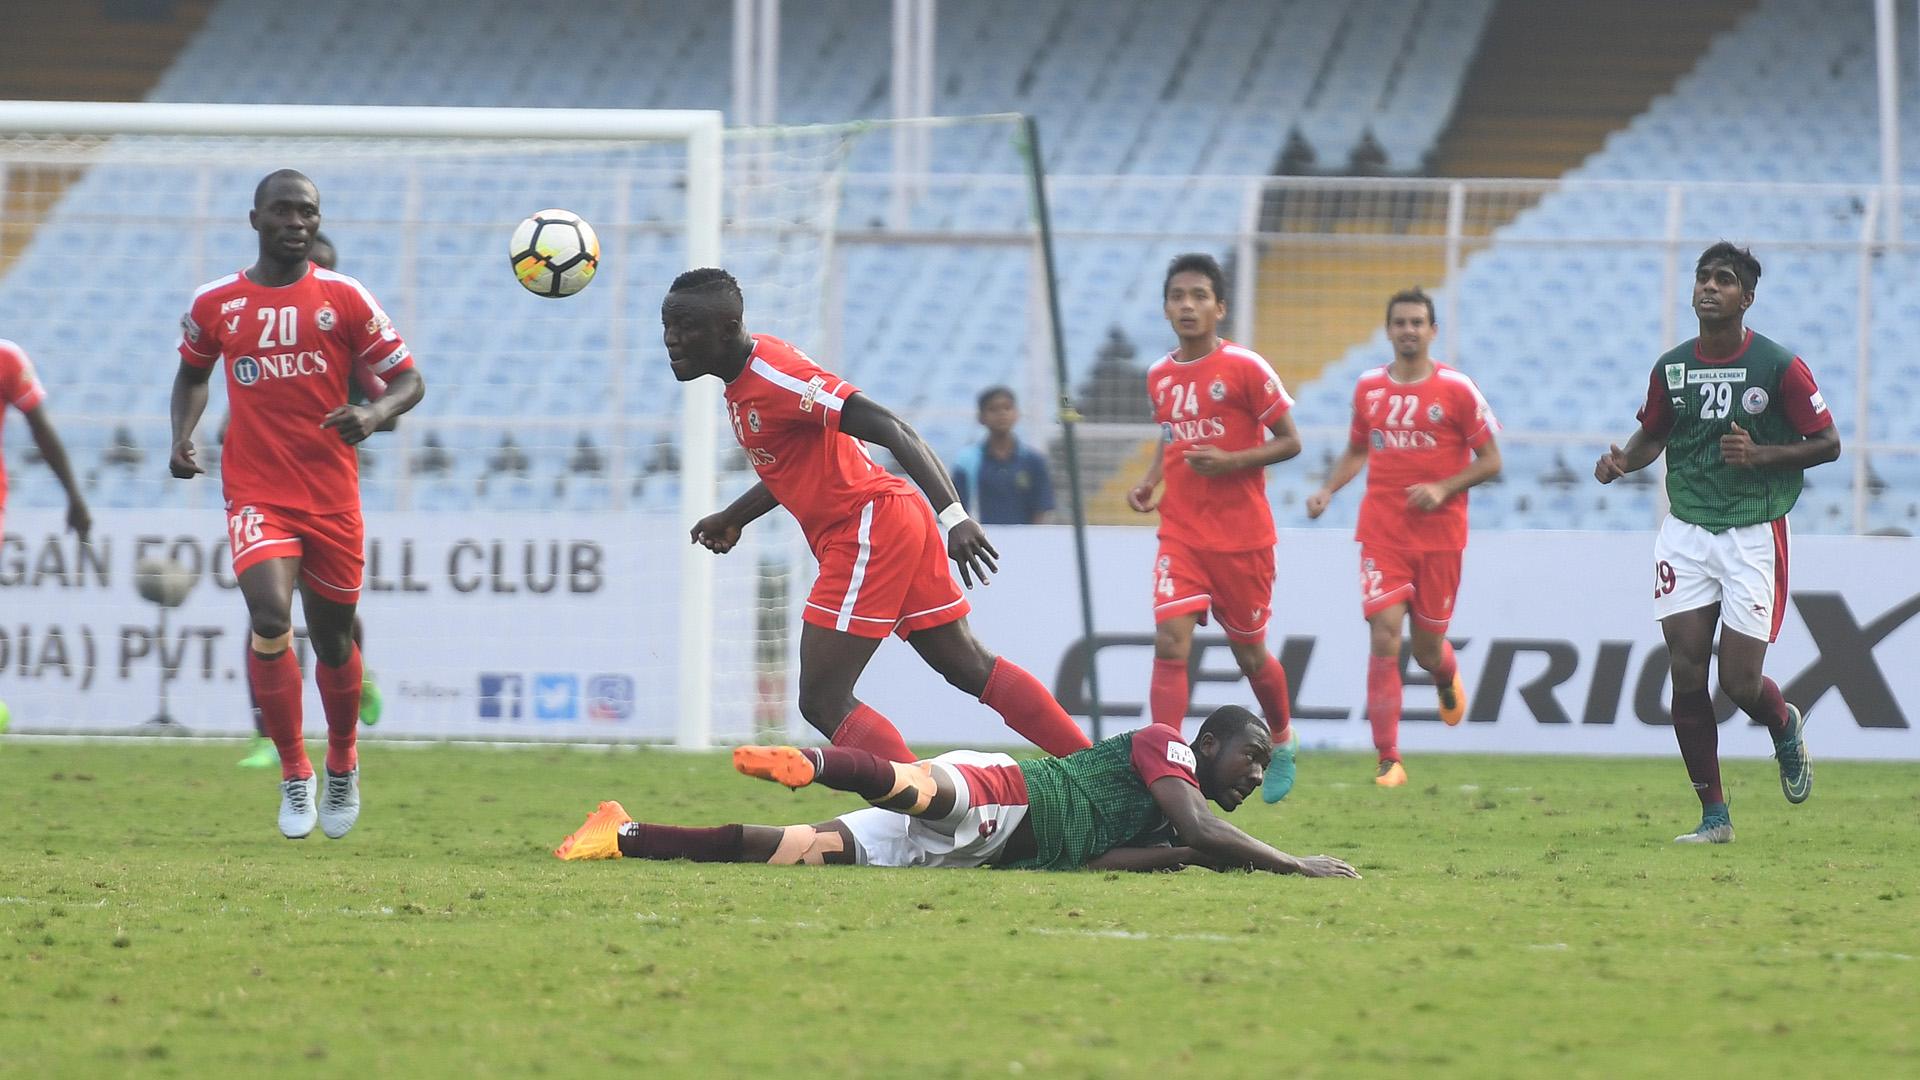 Mohun Bagan Aizawl FC I-League 2017/2018